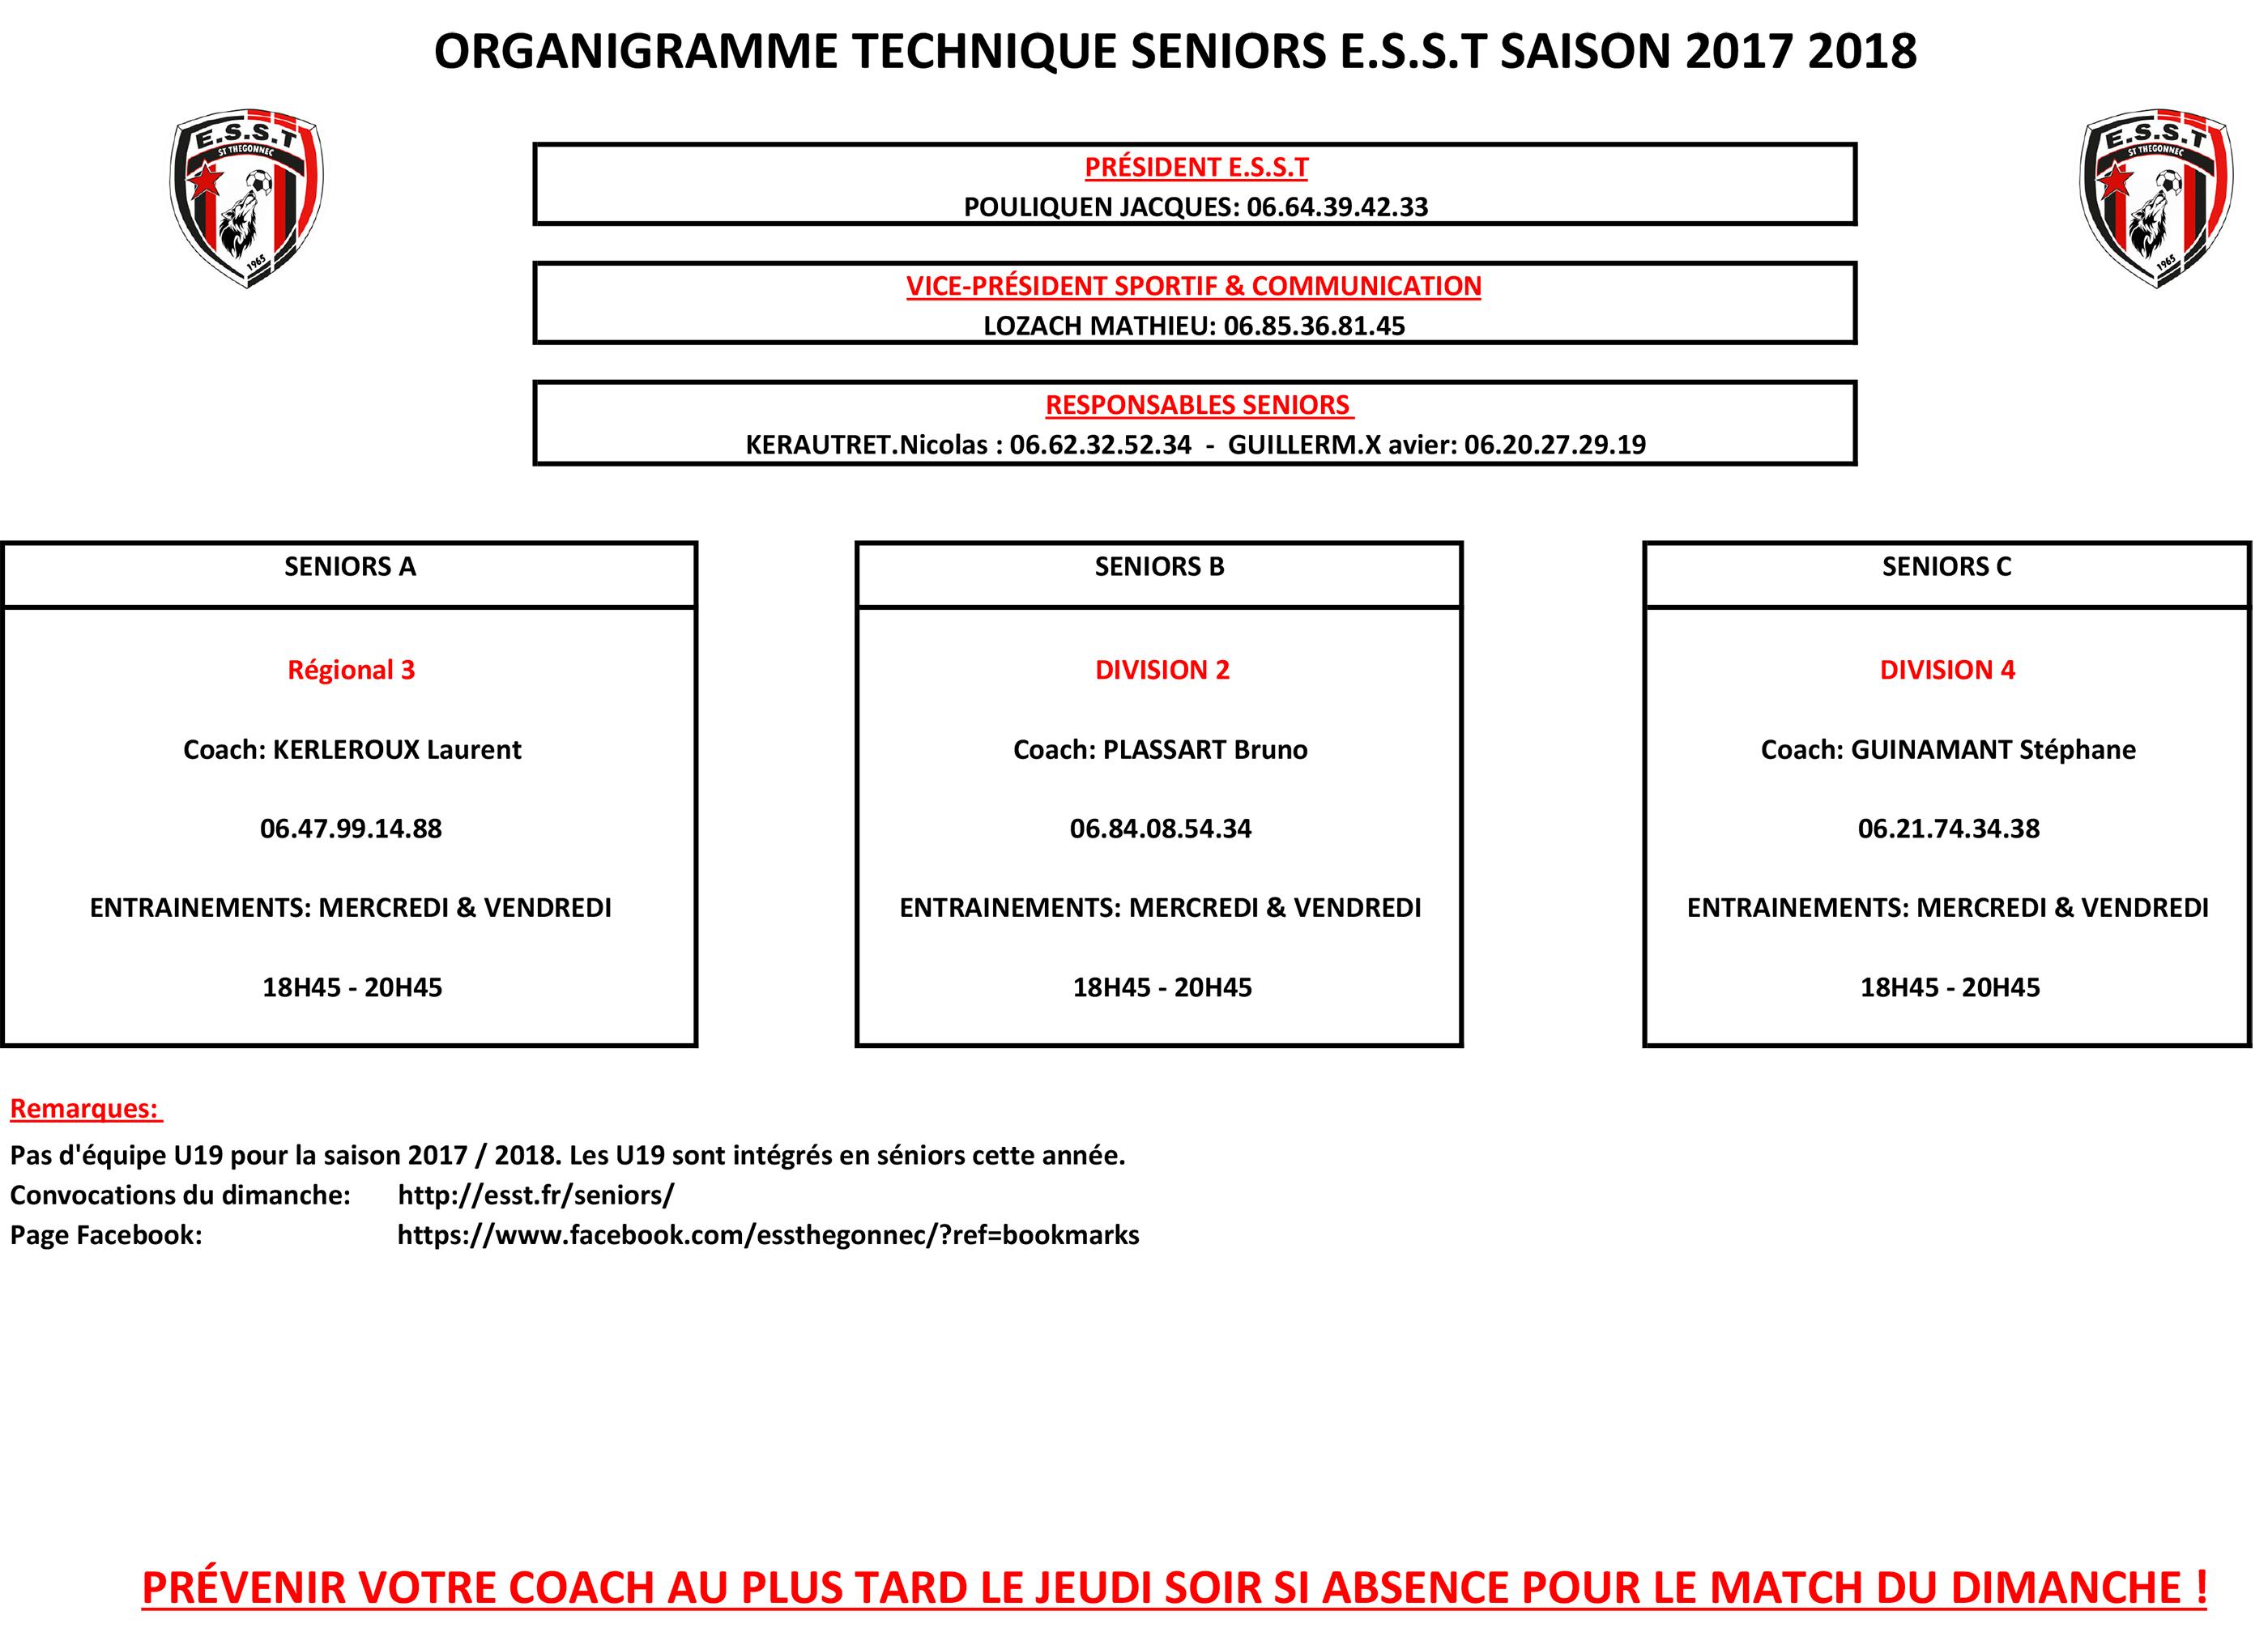 Organigramme-Technique-Seniors-SAISON-2017-2018